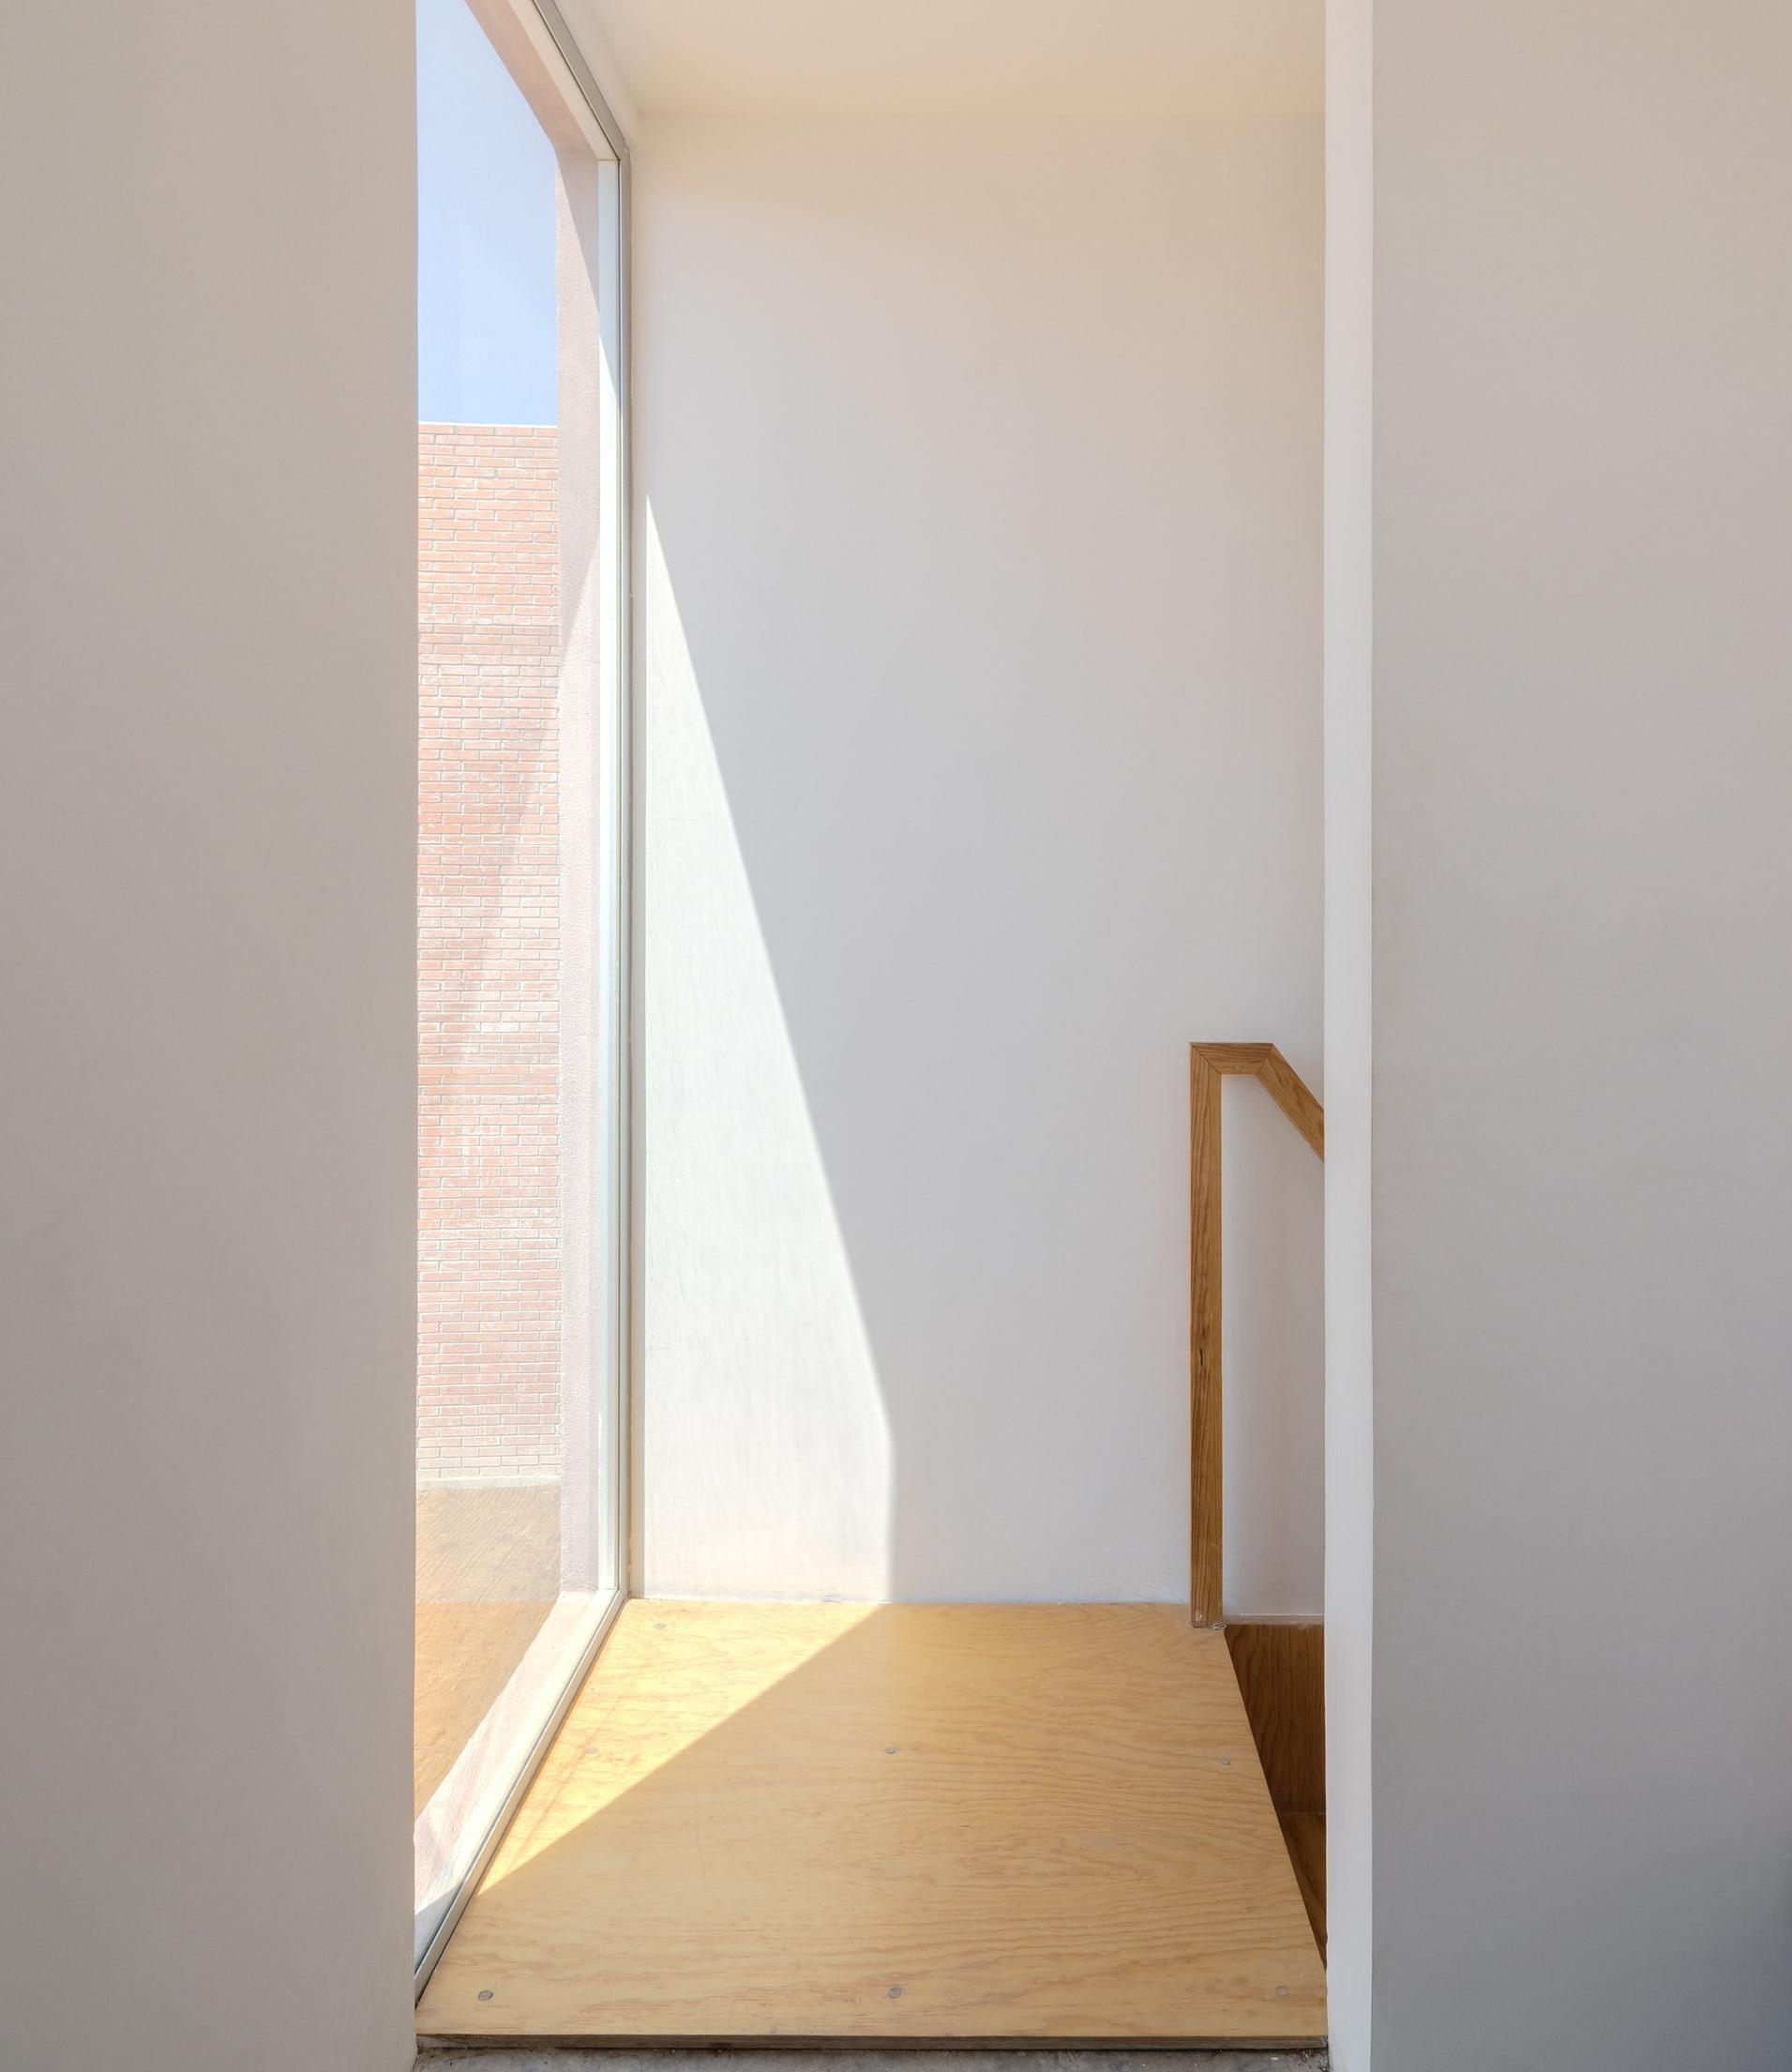 Una gran ventana para que entre luz natural